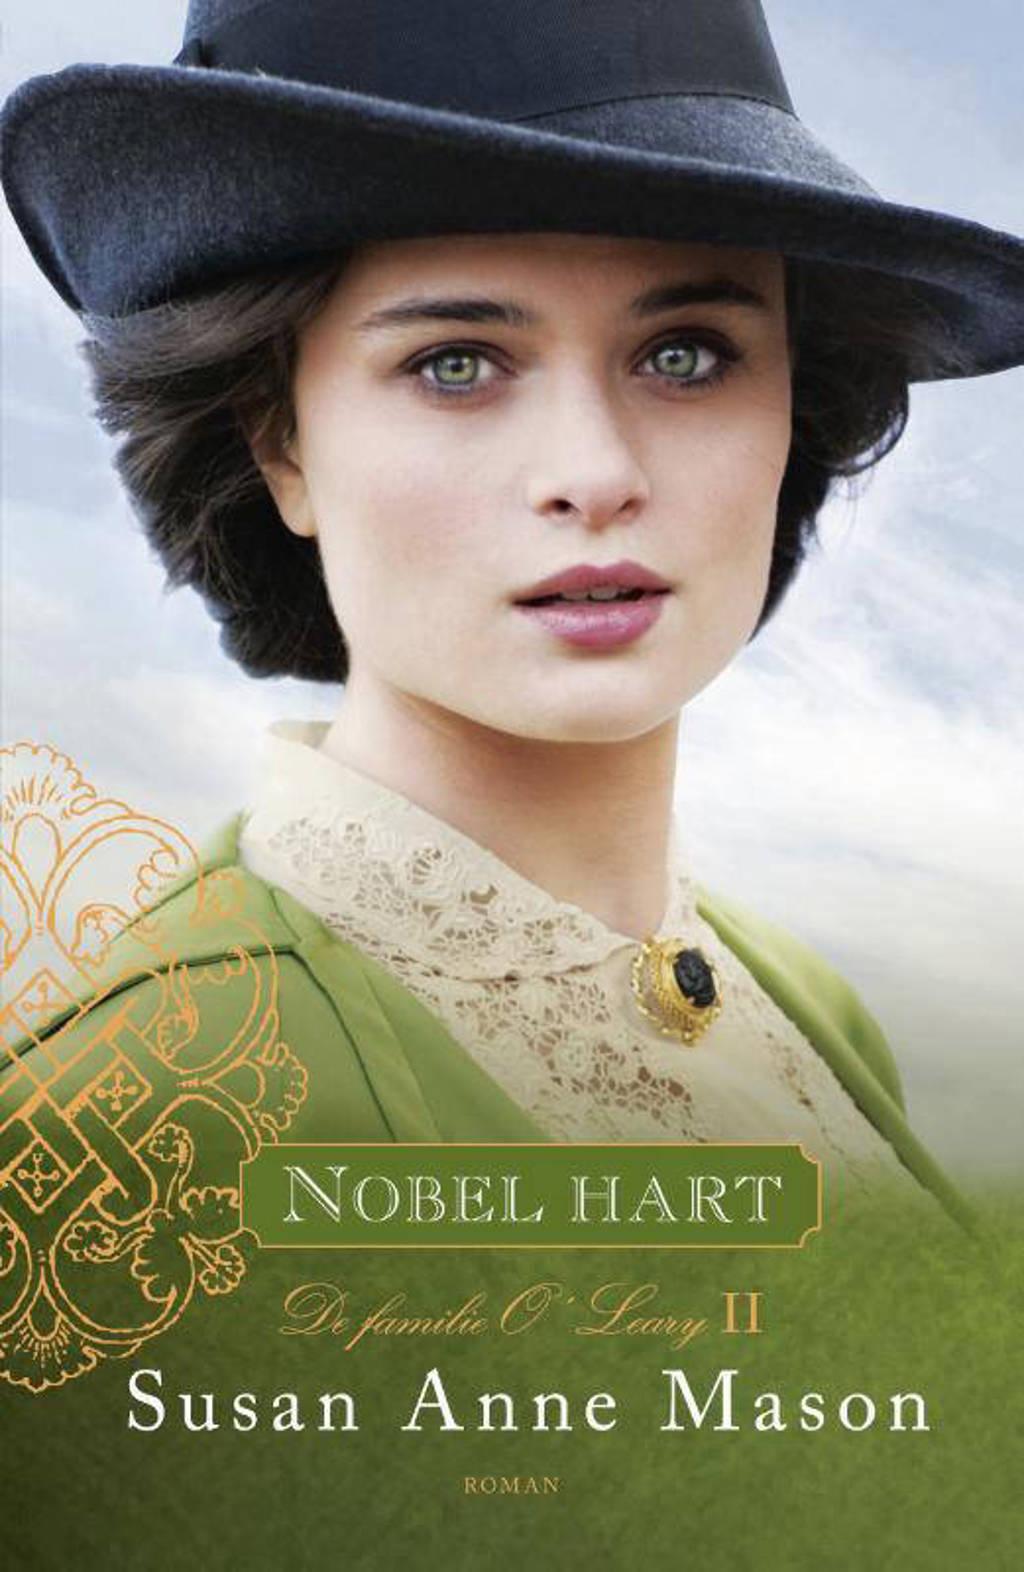 De family O'Leary: Nobel hart - Susan Anne Mason